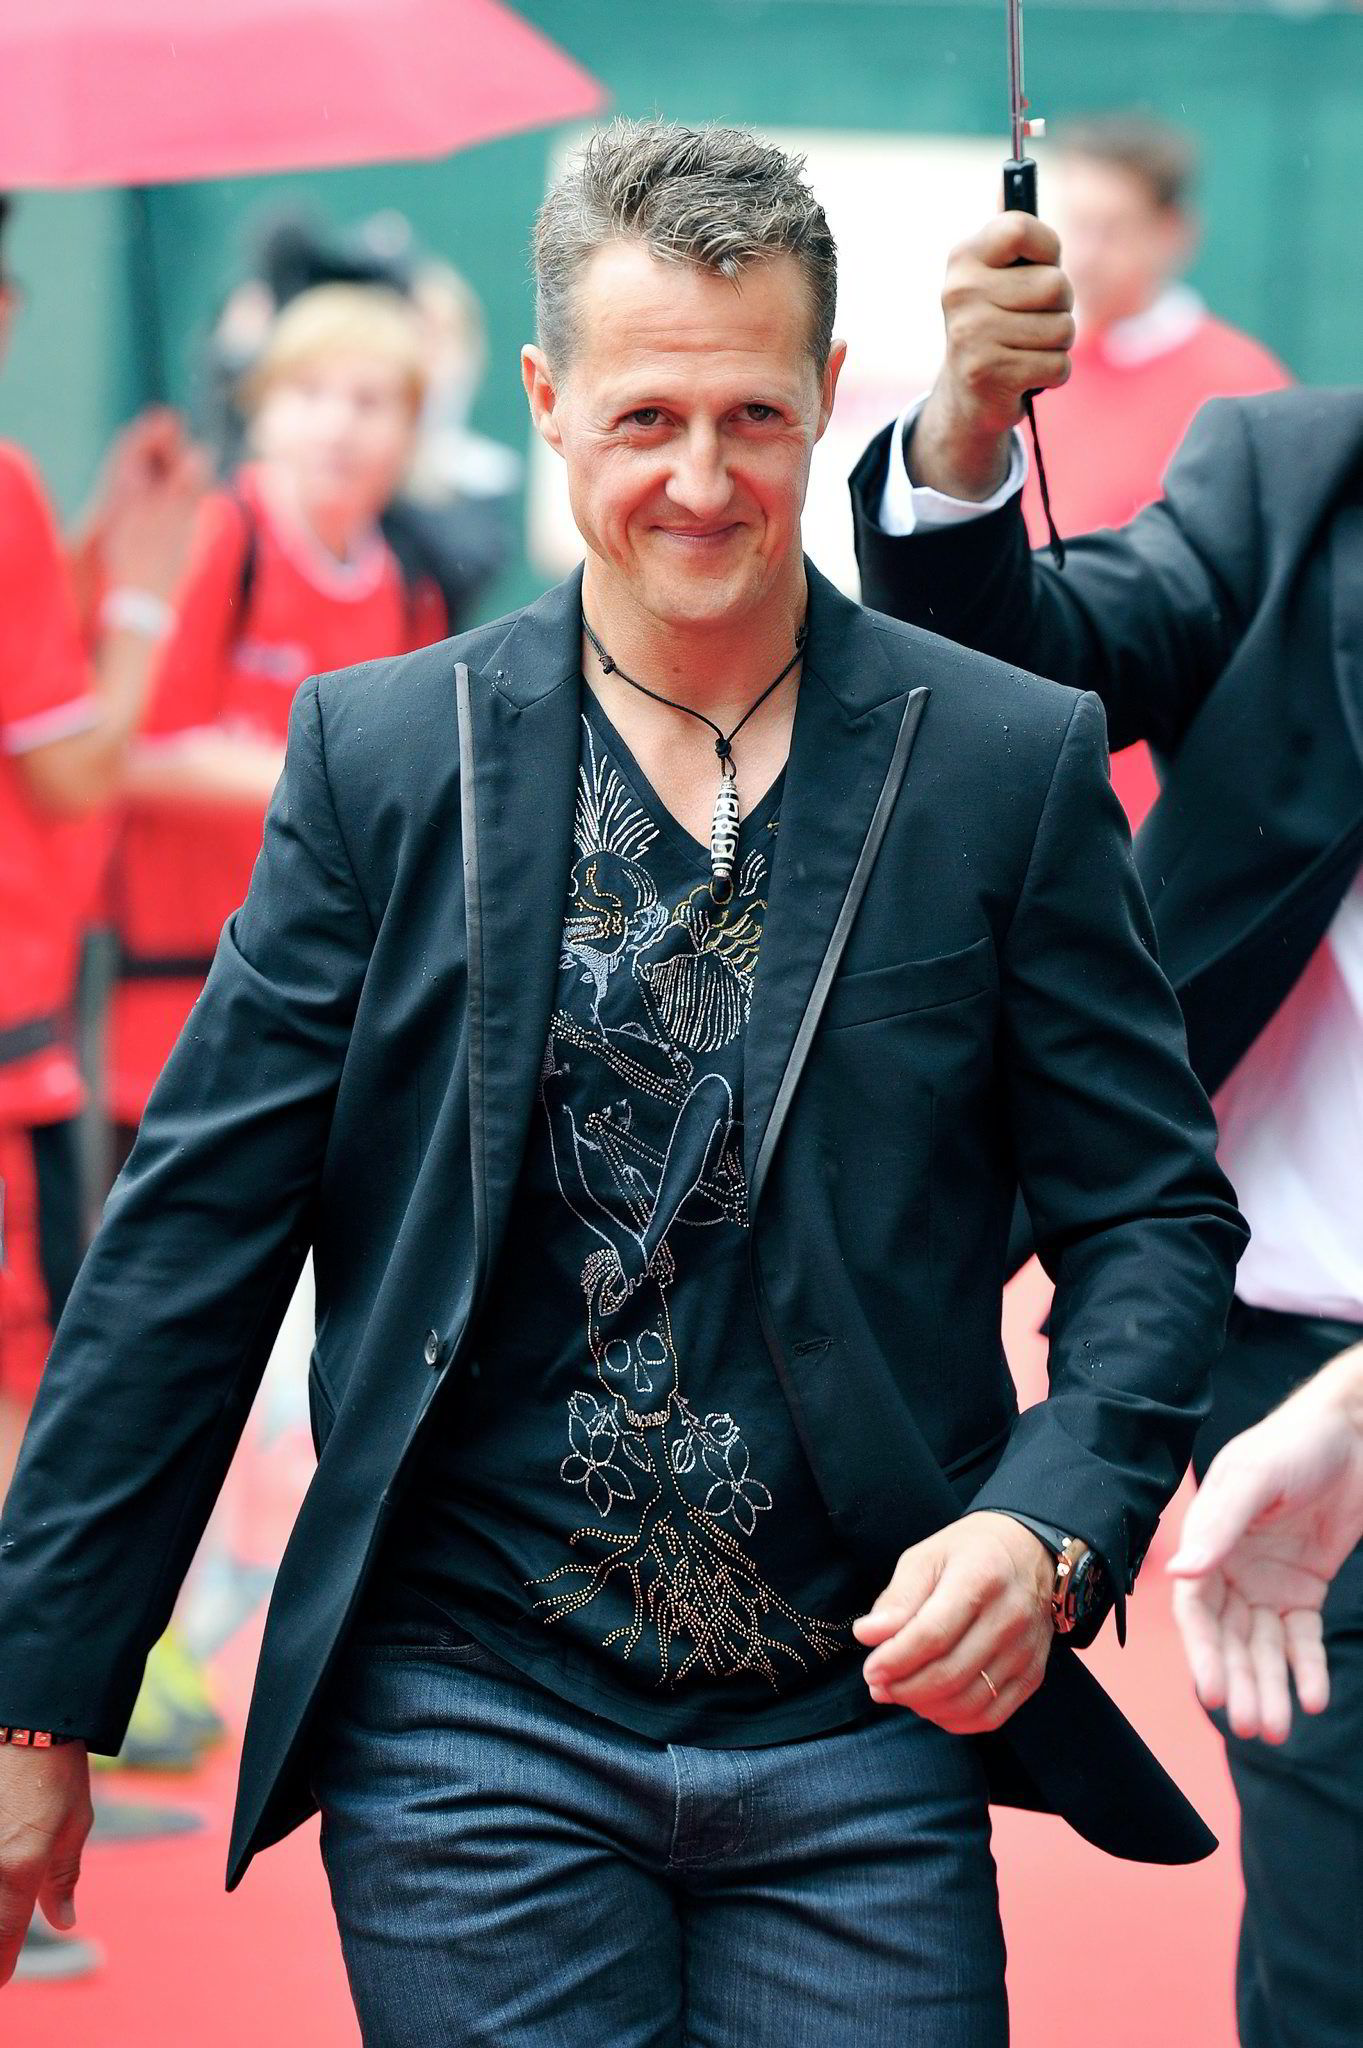 Formel 1- verdensmesteren Michael Schumacher. Foto: